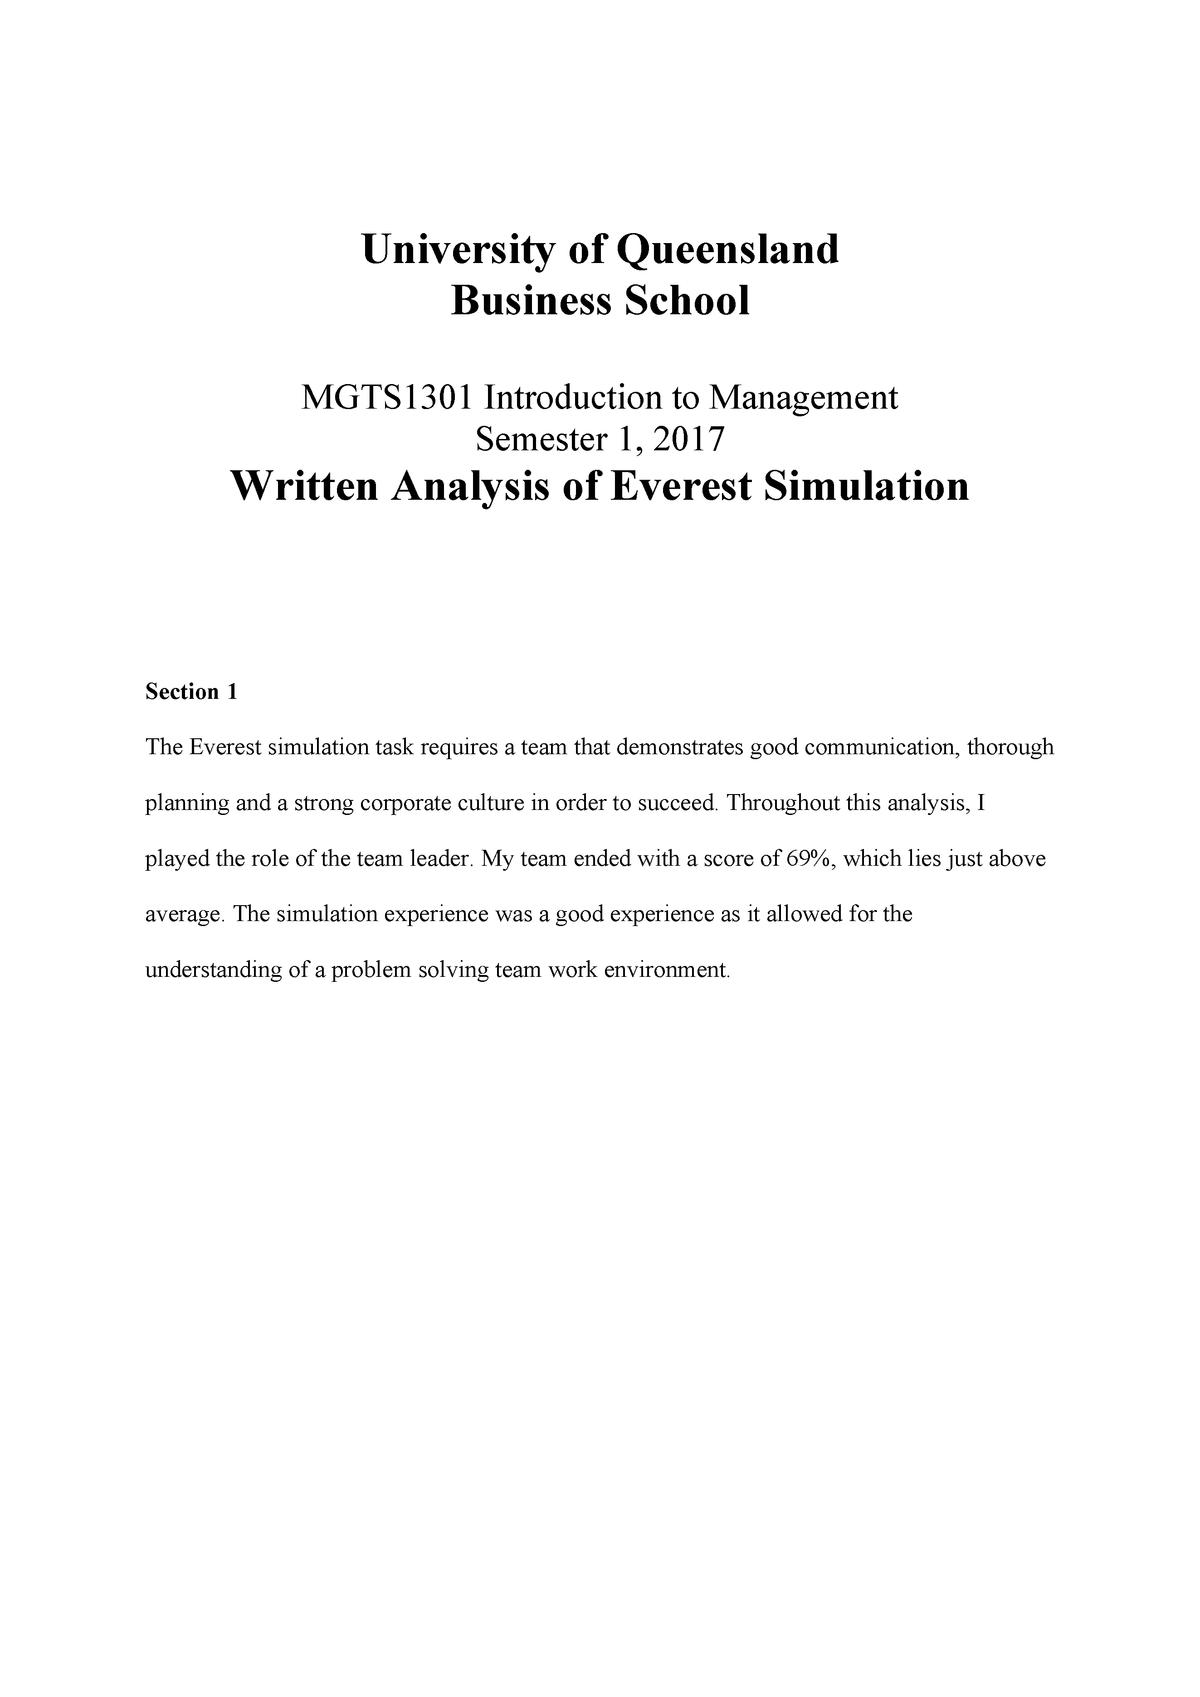 analysis example paragraph